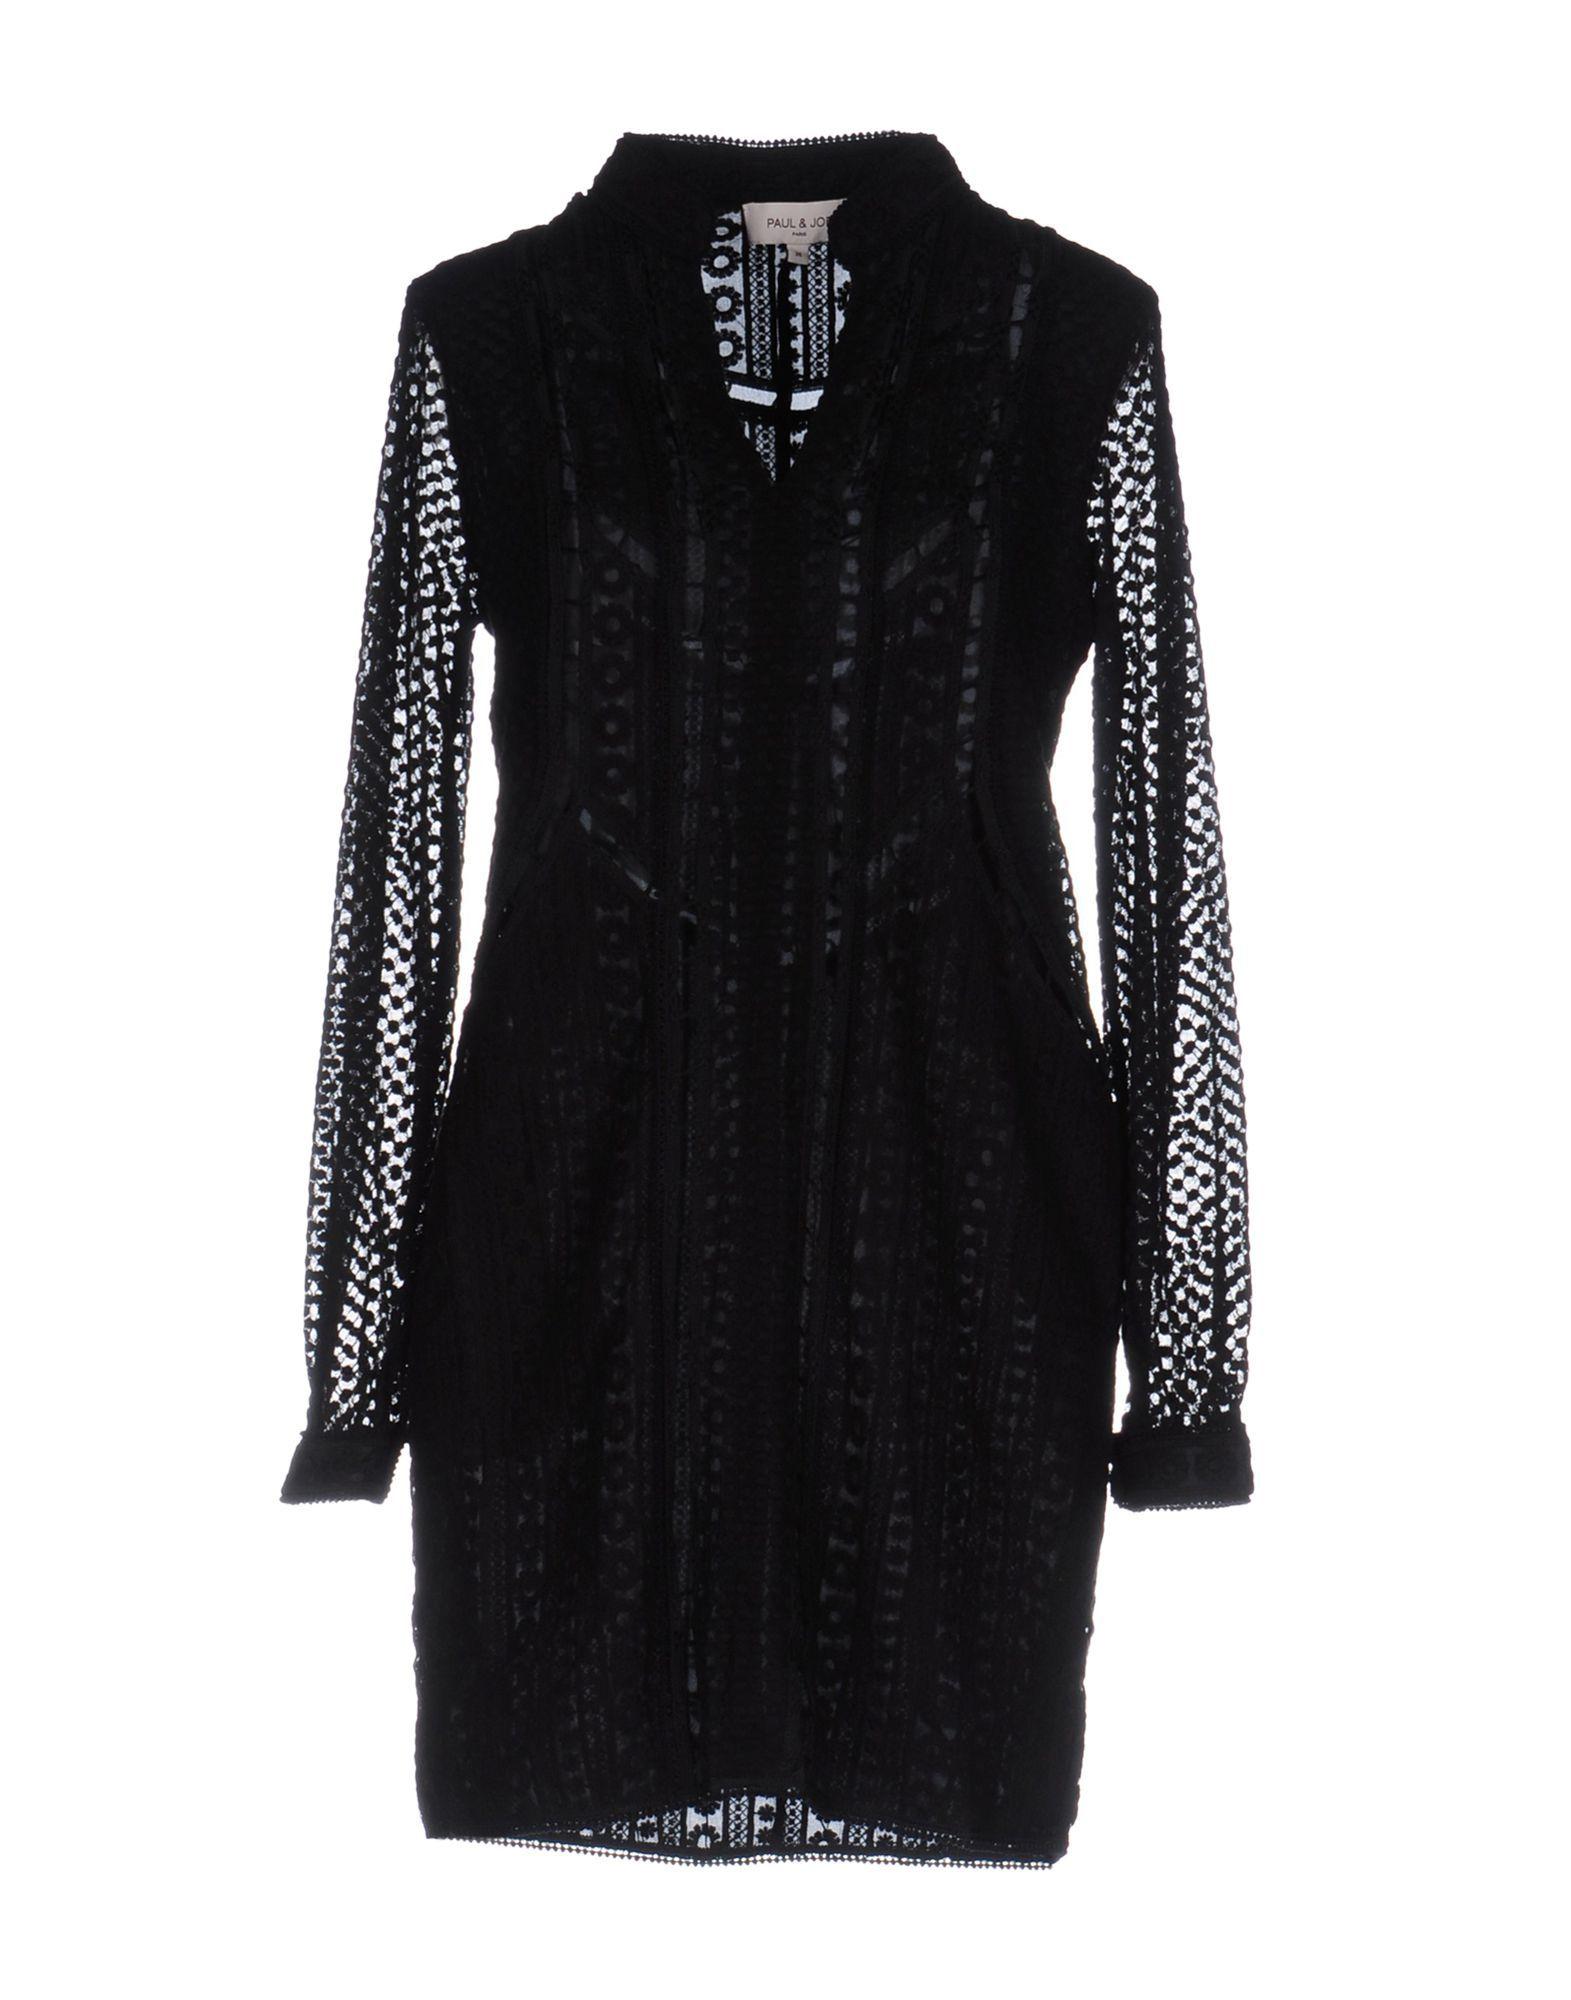 Dress Paul & Joe Black Women's Polyester